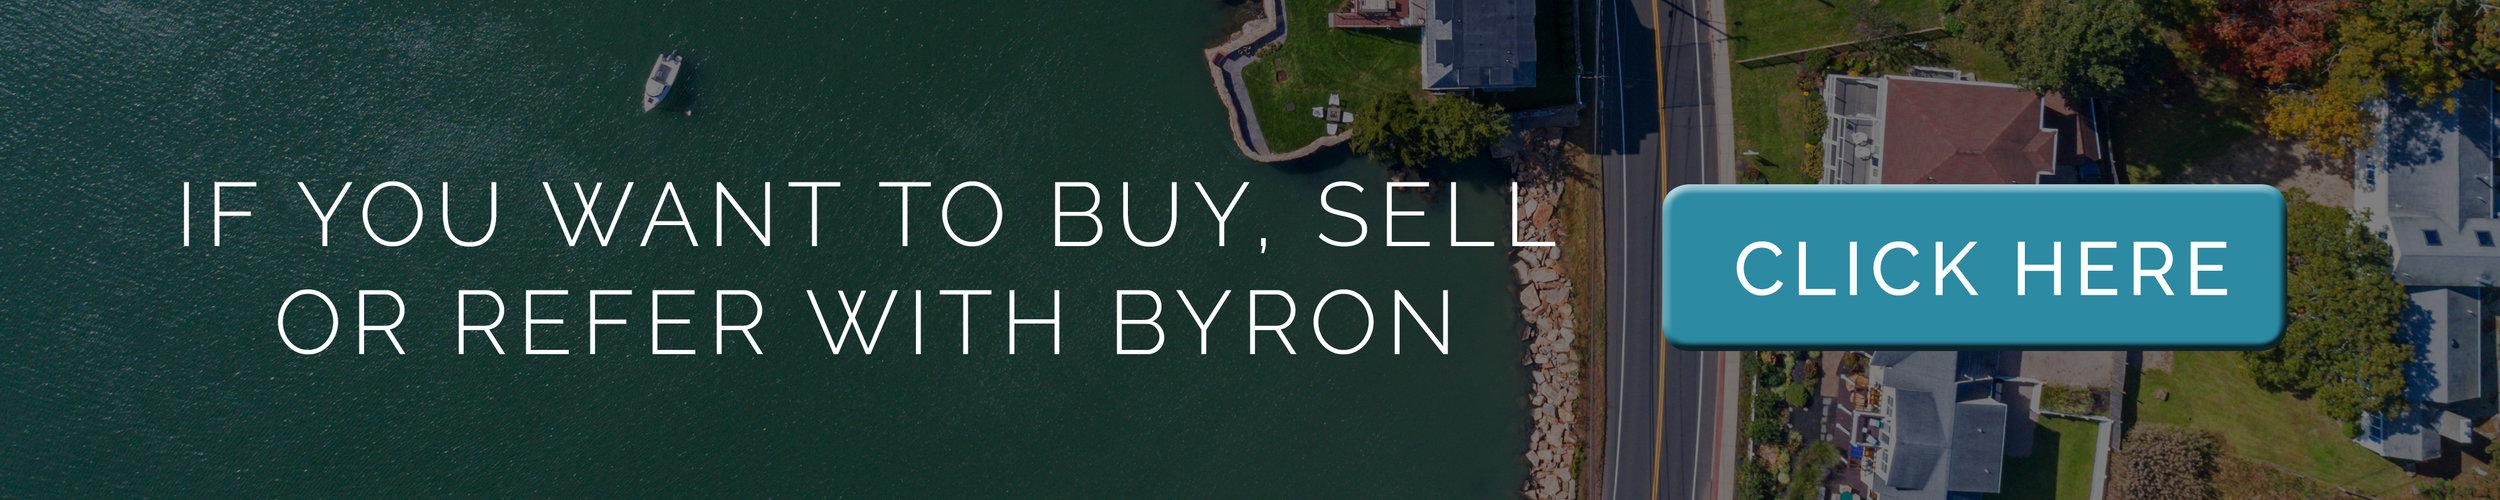 Byron_CTA_071519.jpg